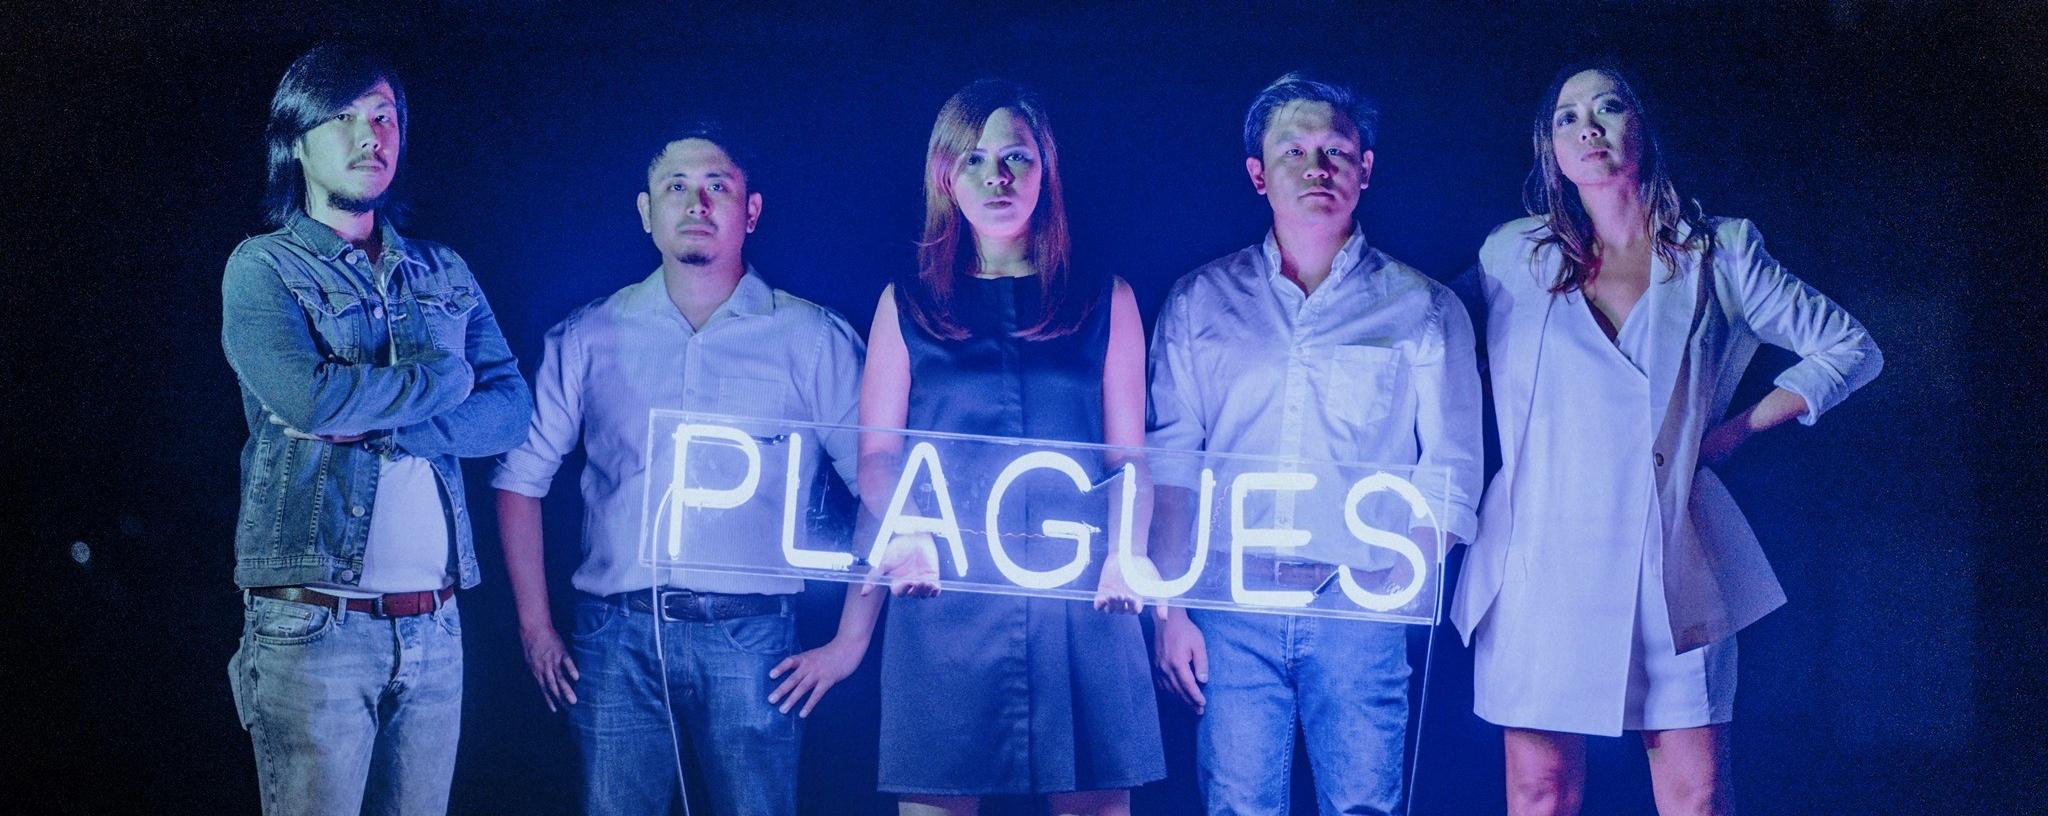 Taken by Cars' Plagues Vinyl Launch Party